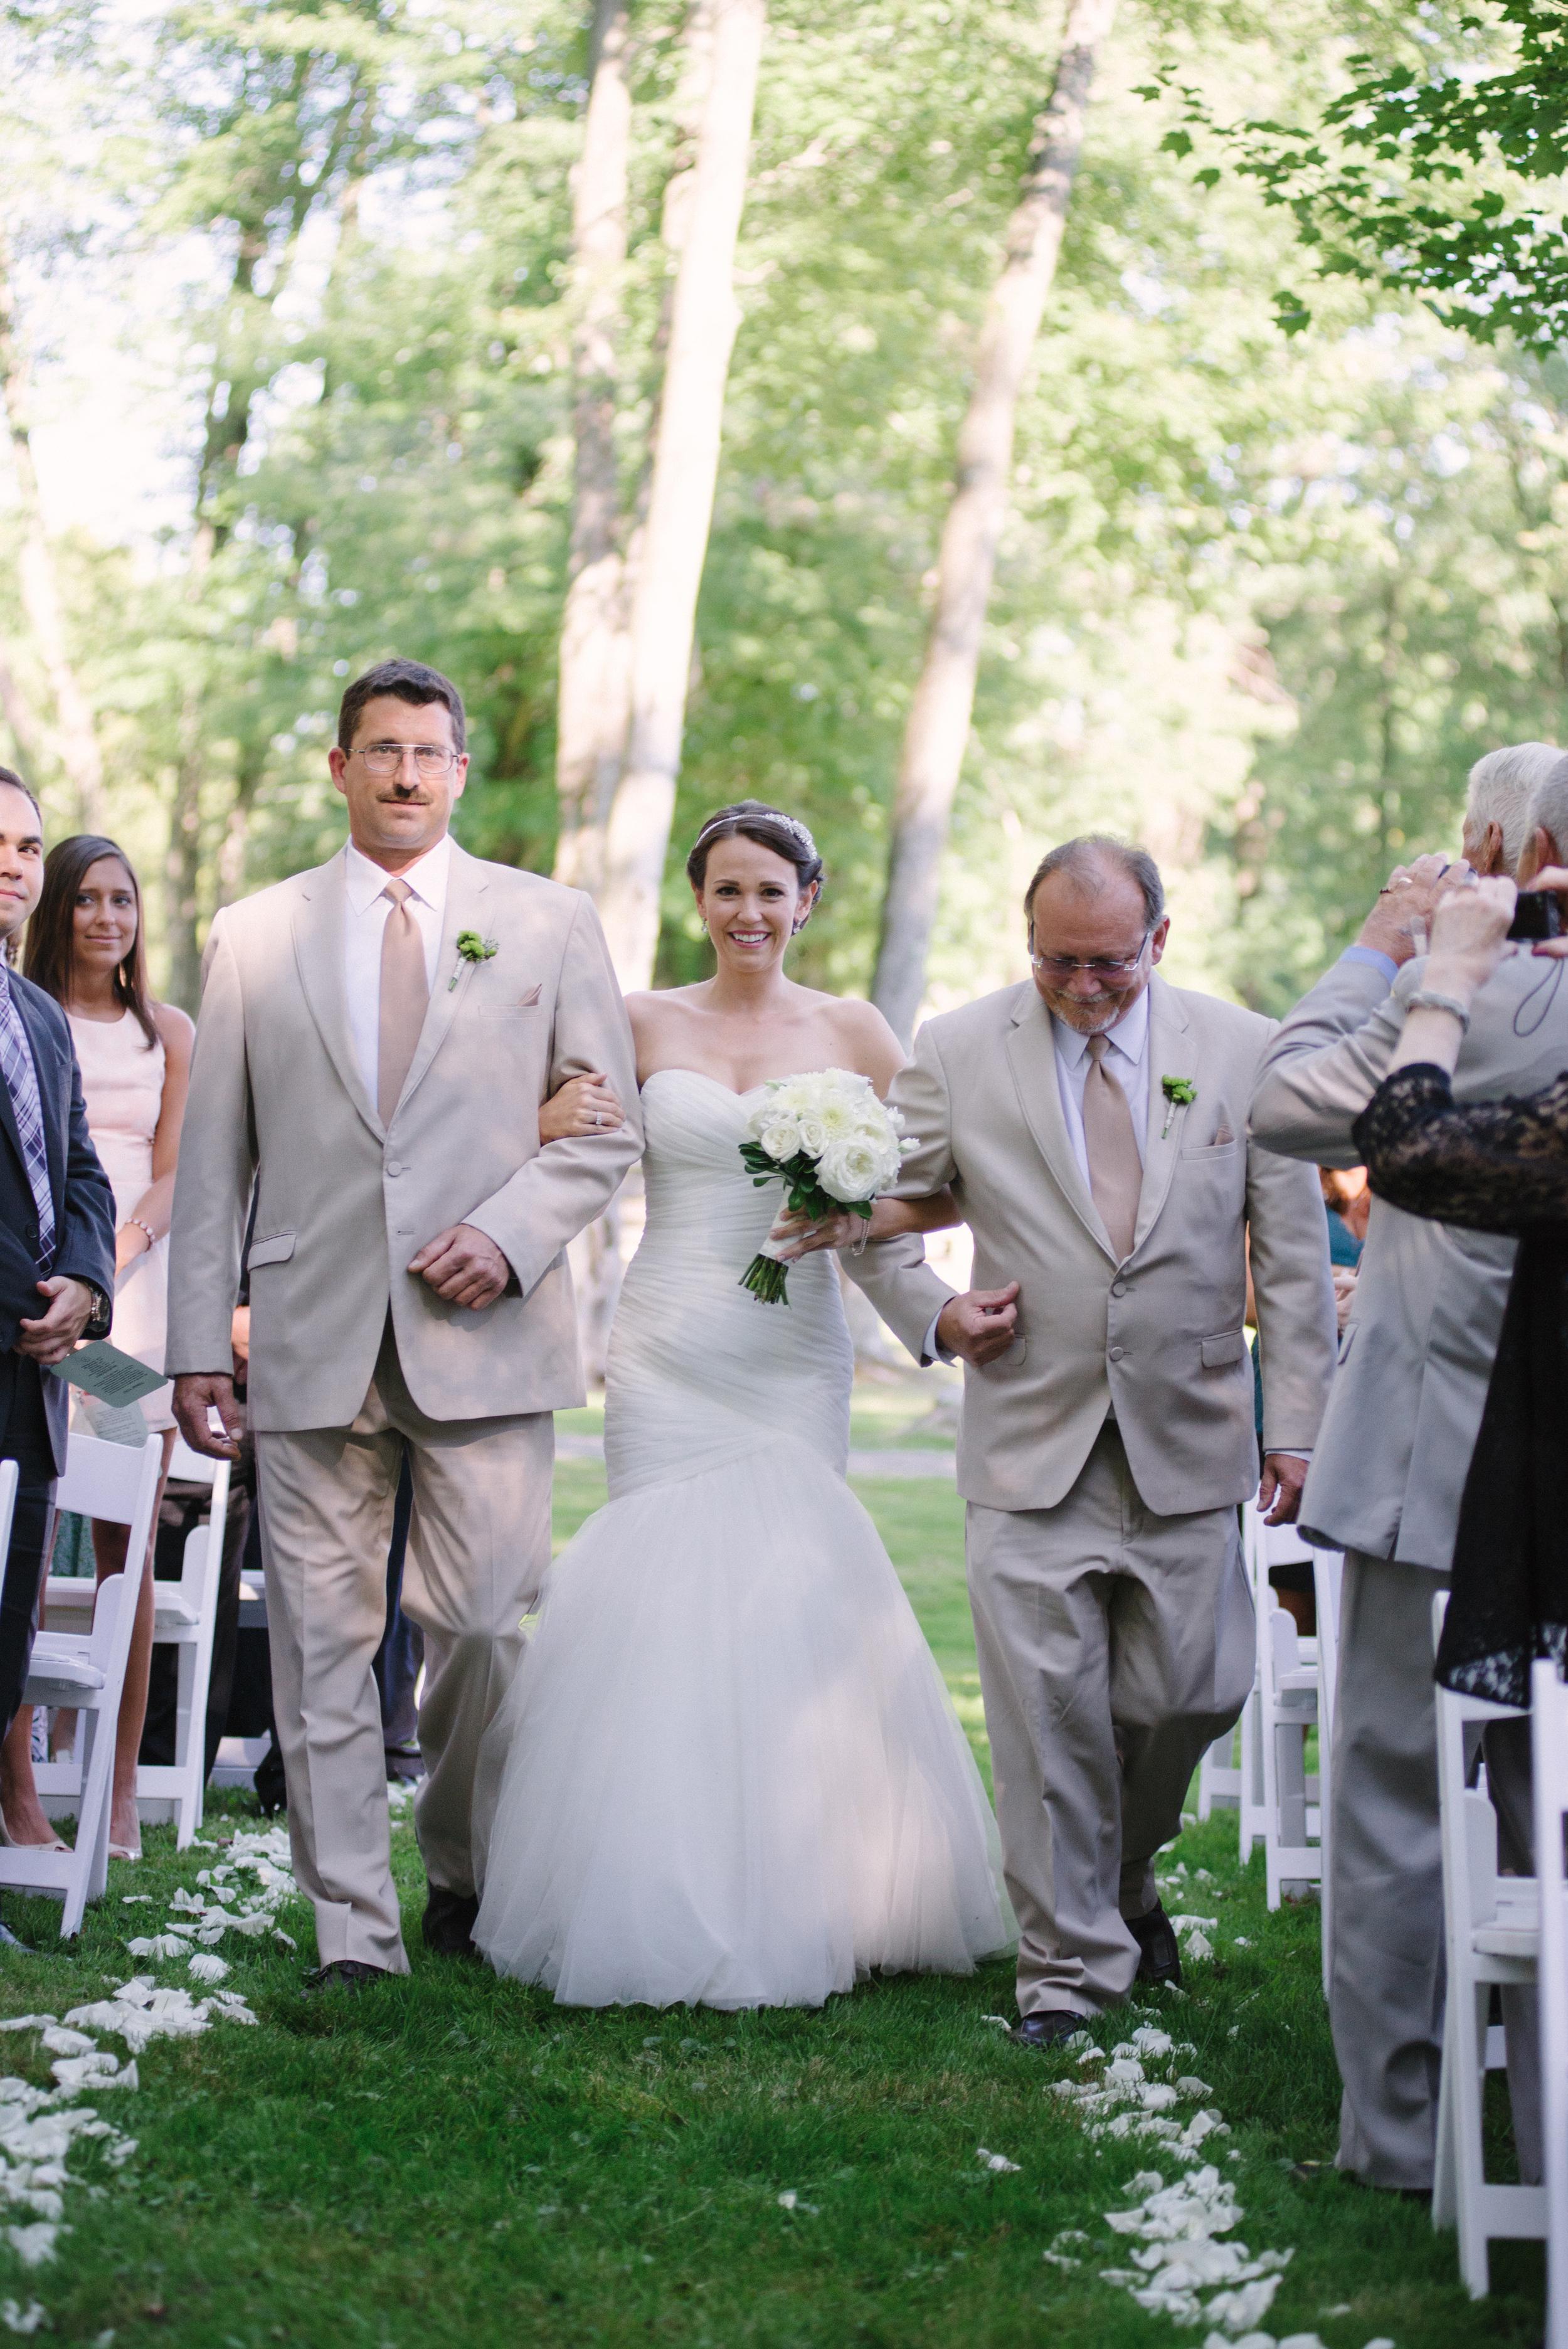 Matt_Swetel_Photography_Erin_and_Jeff_married033.jpg